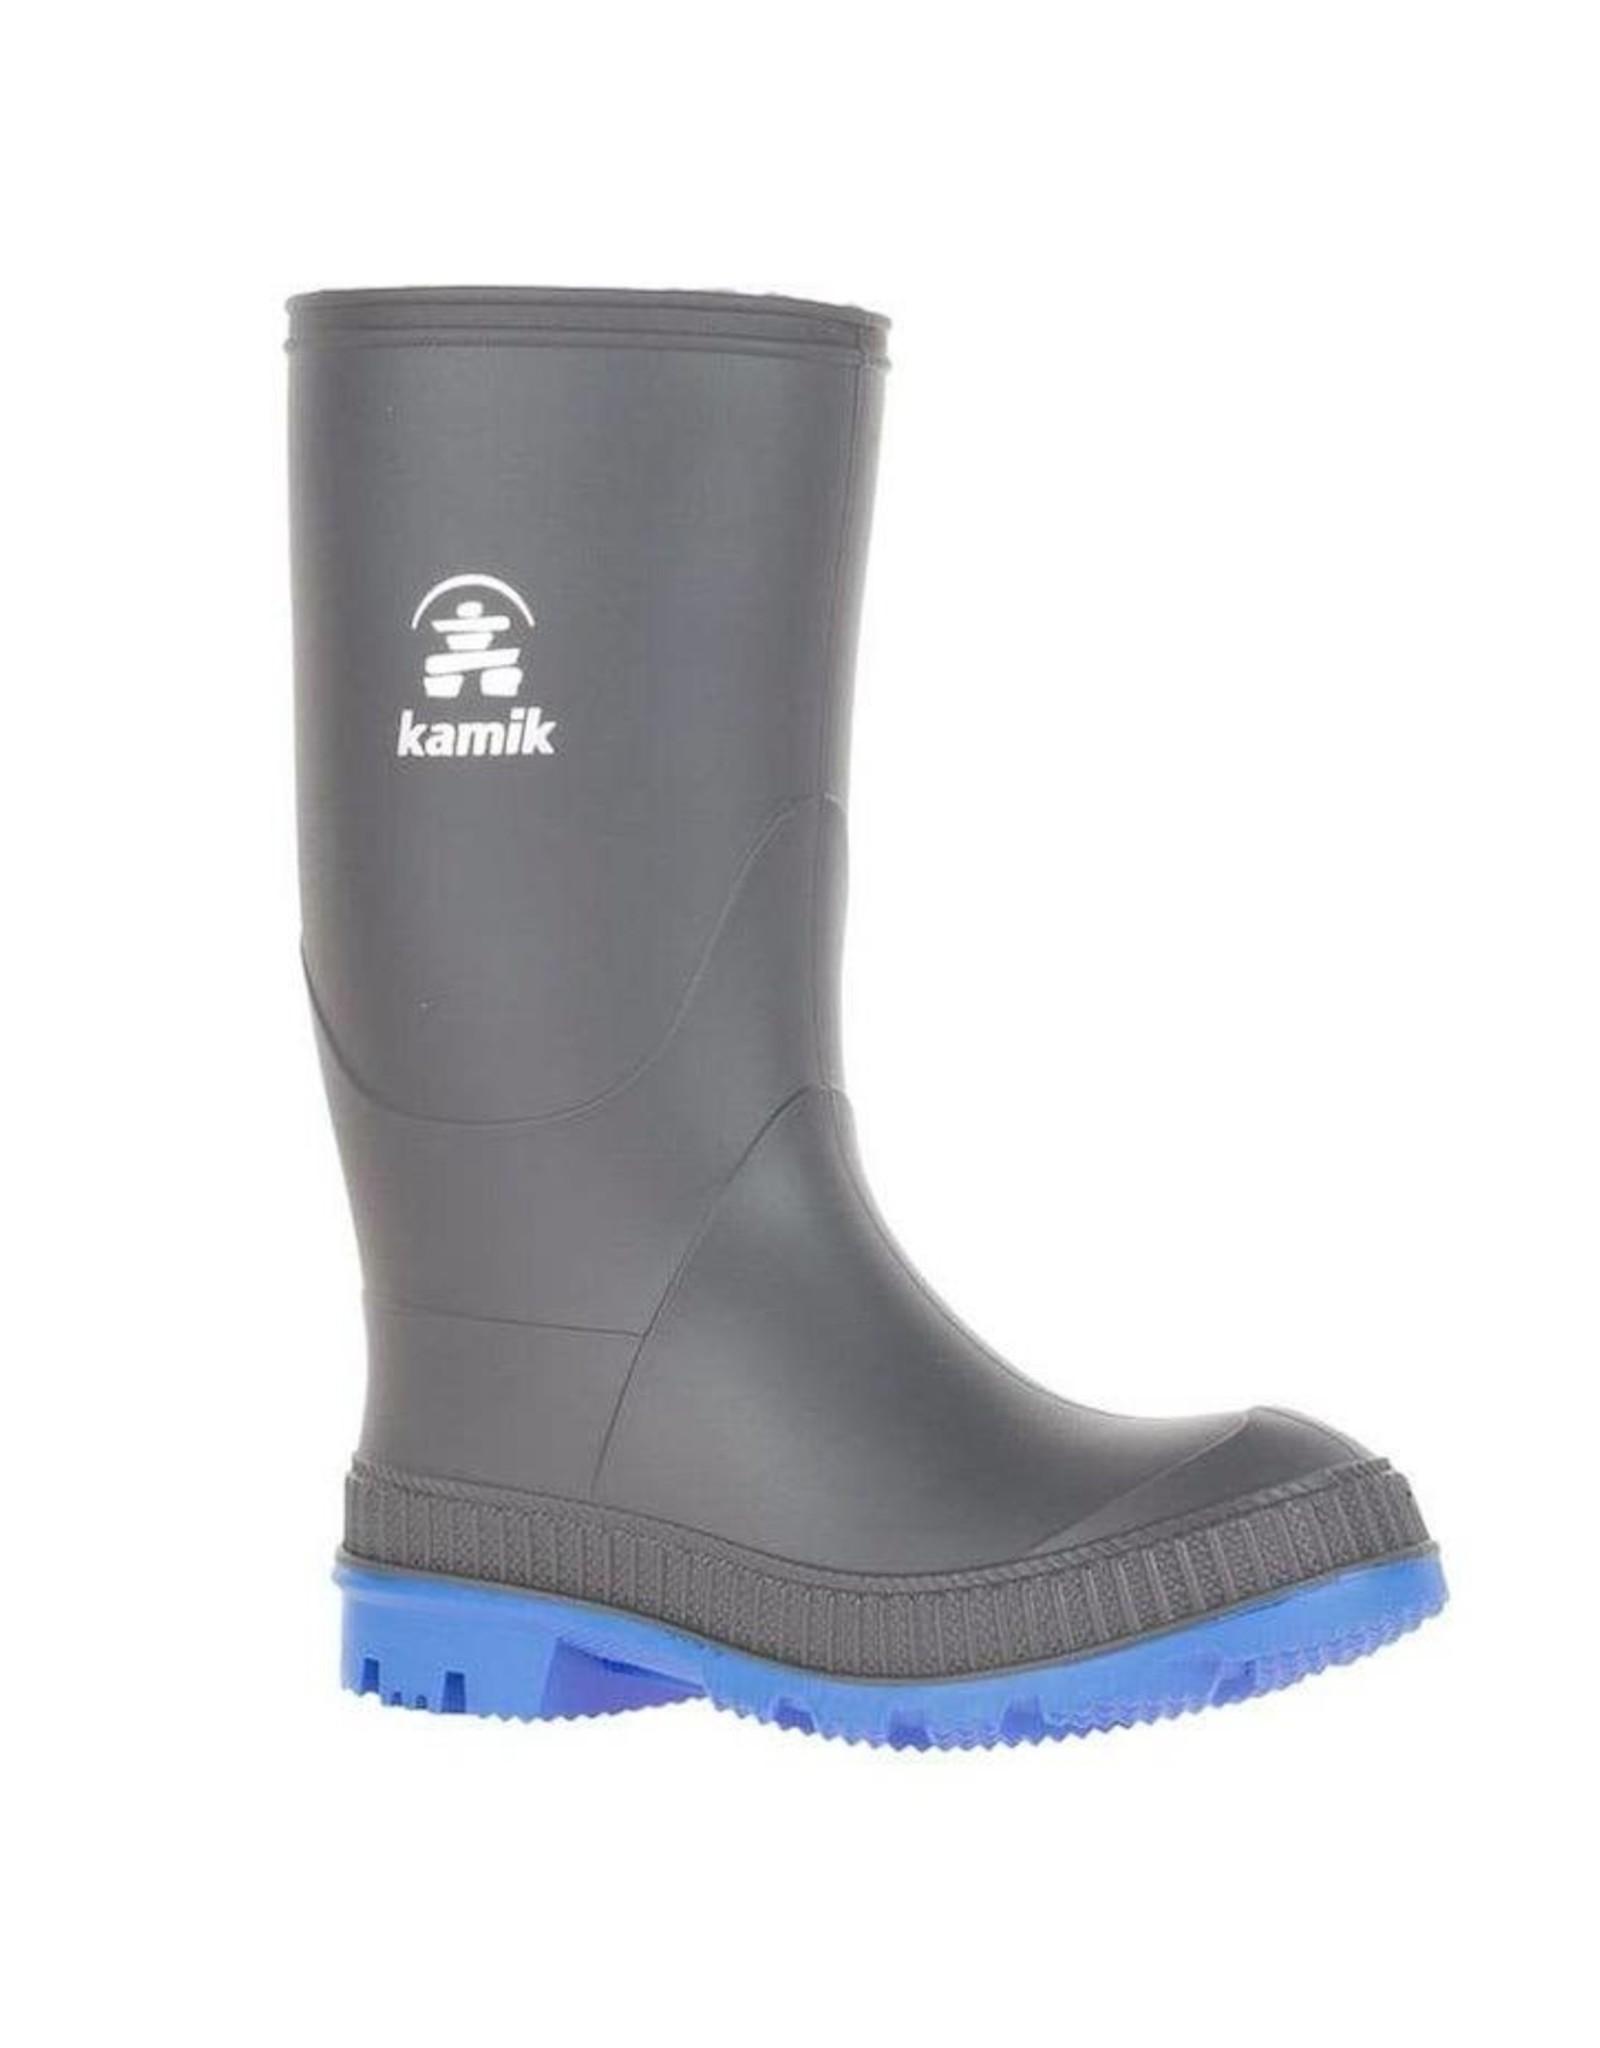 Kamik STOMP Kids Rainboots Charcoal & Blue